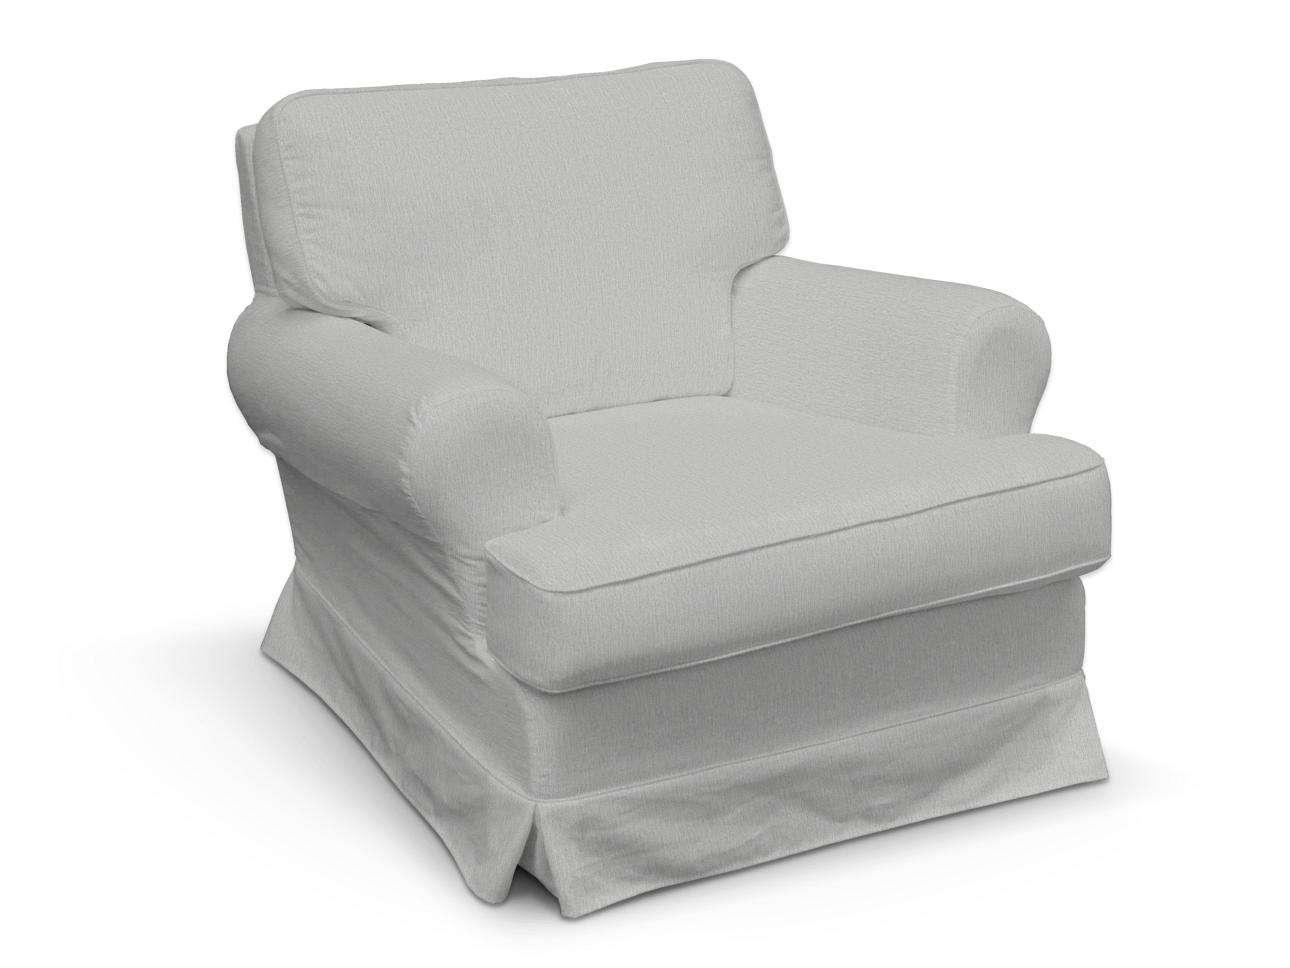 Pokrowiec na fotel Barkaby fotel Barkaby w kolekcji Chenille, tkanina: 702-23